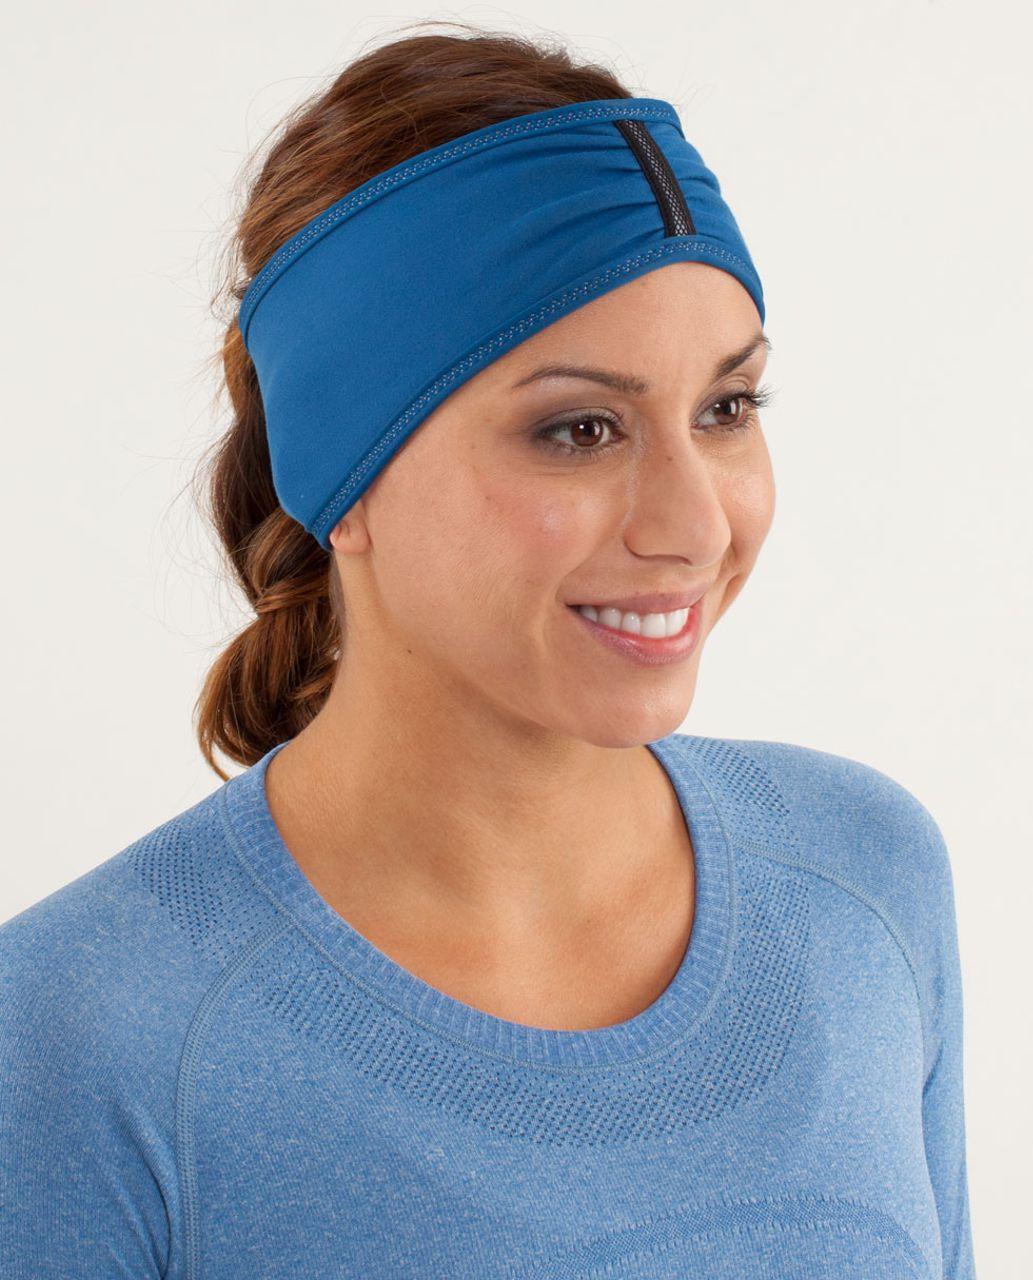 Lululemon Brisk Run Headband - Limitless Blue / Clarity Yellow